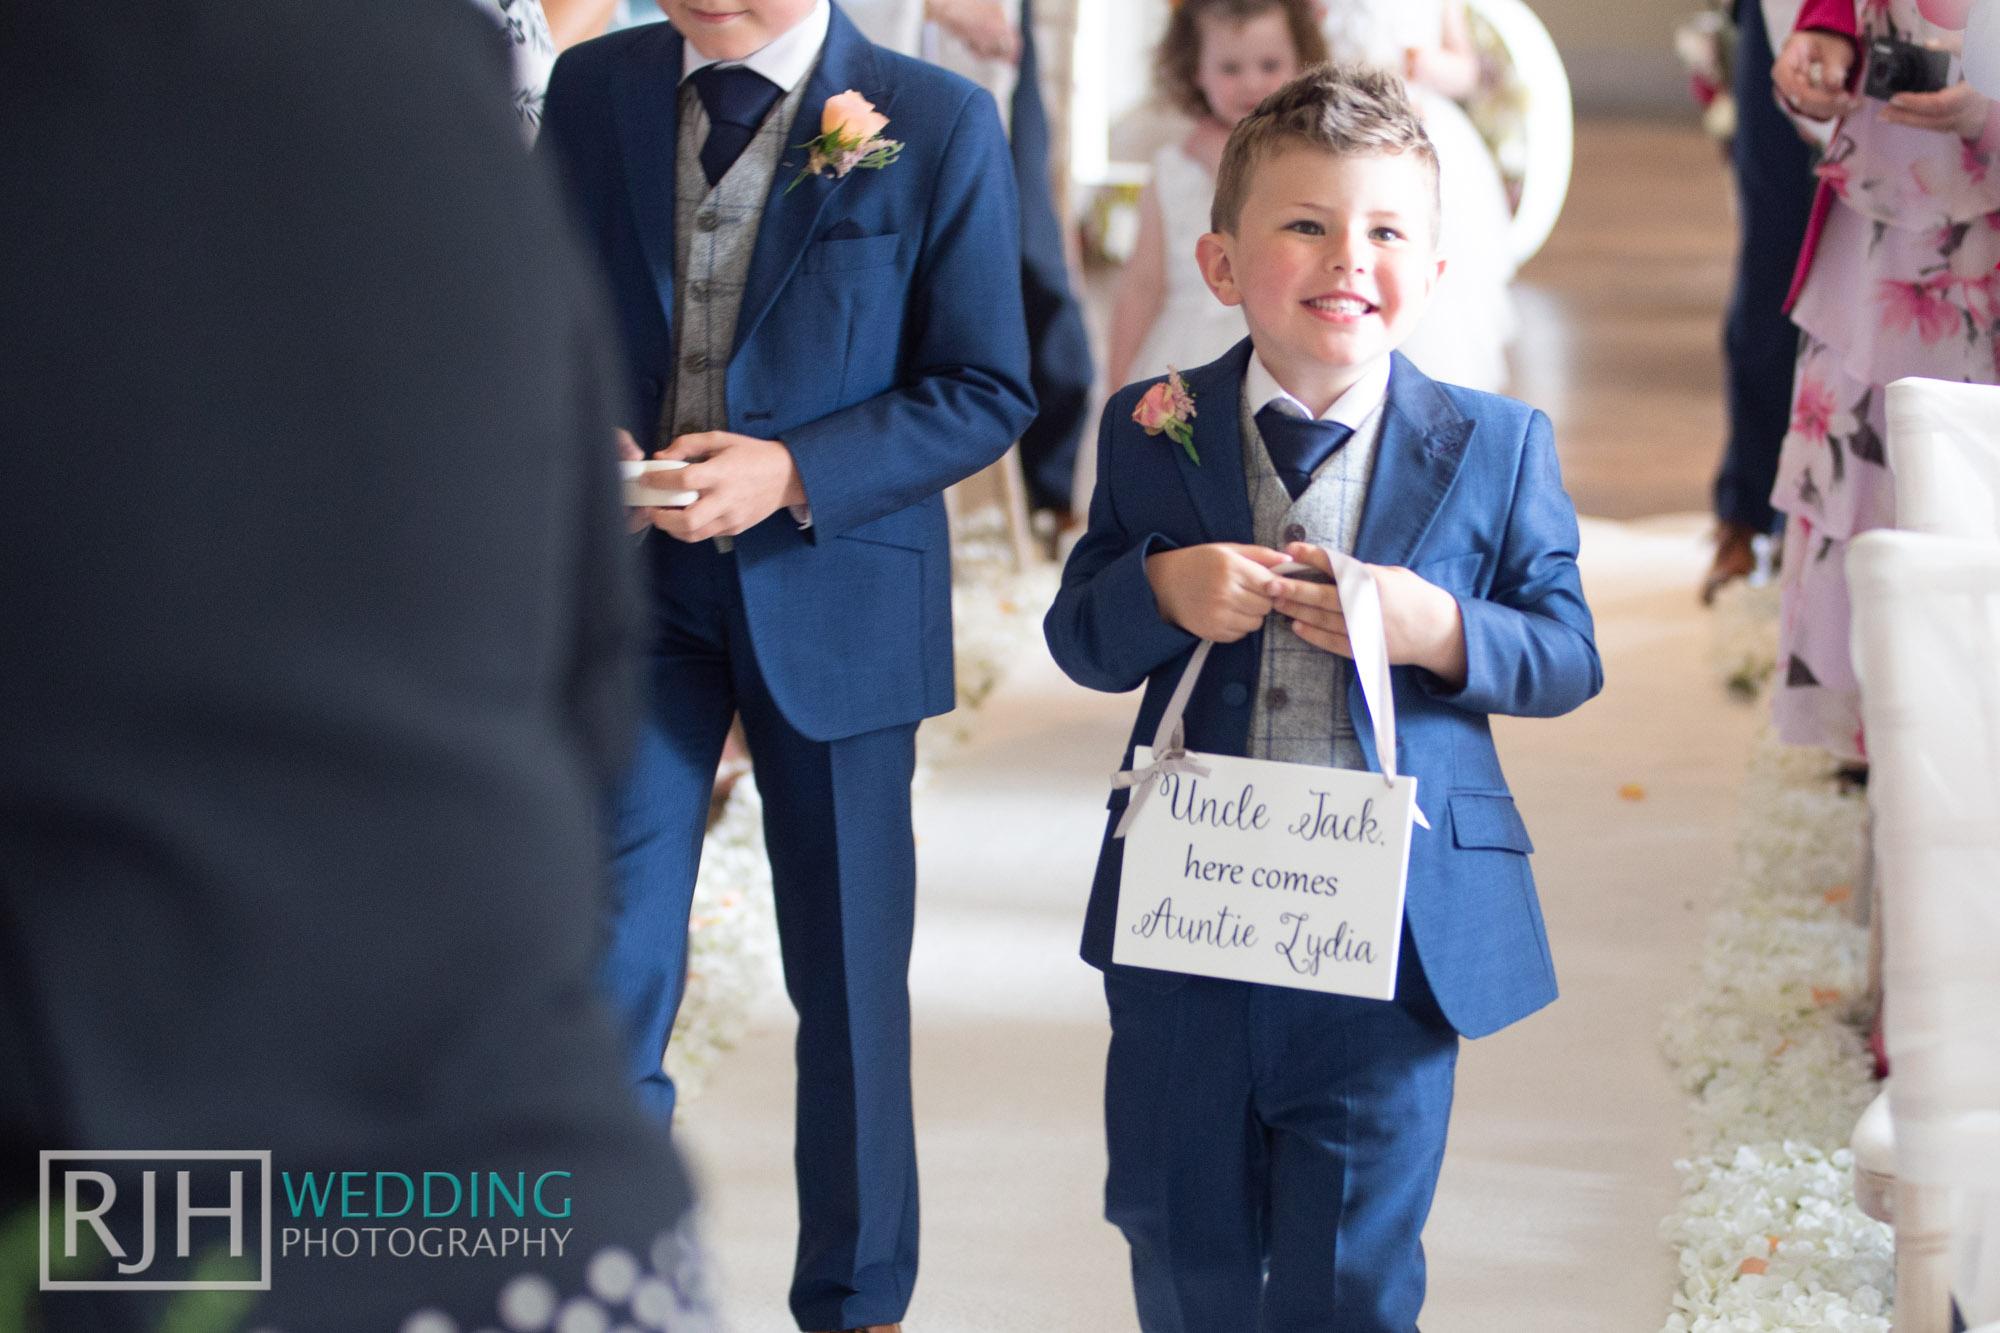 Whirlowbrook Hall Wedding Photography_Jack & Lydia_031_IMG_4228.jpg